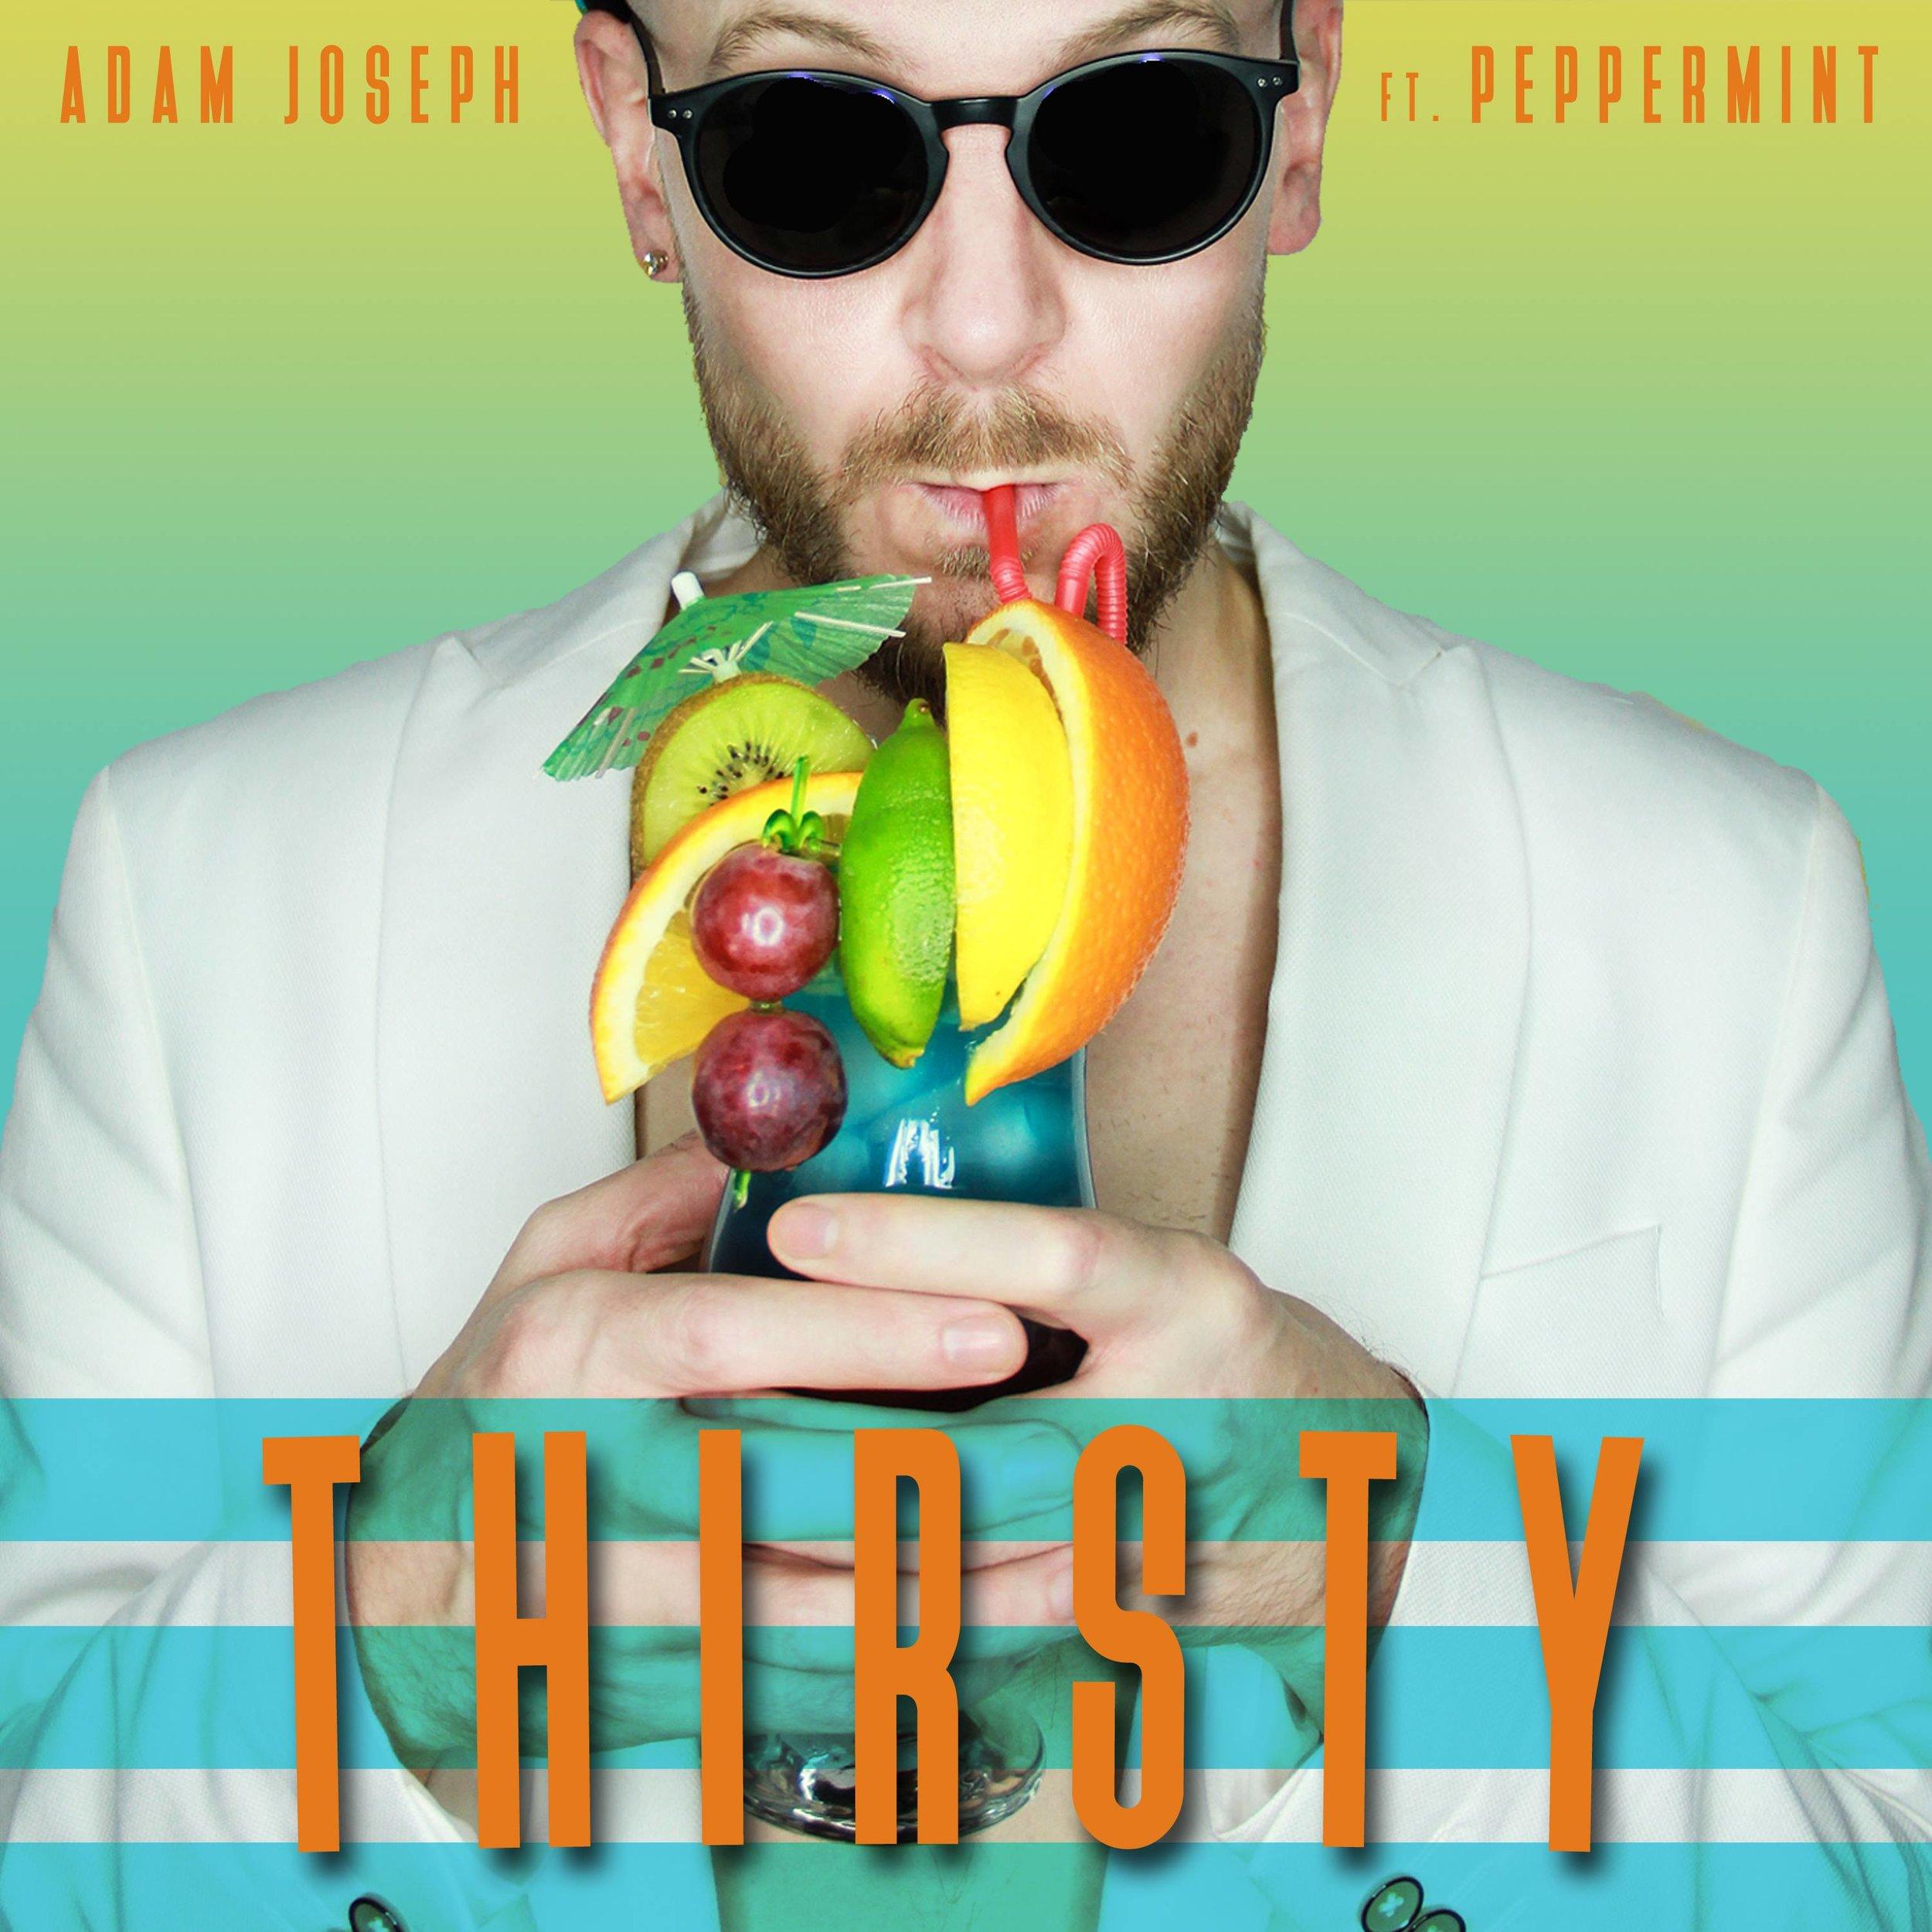 Adam Joseph - Thirsty ft. Peppermint